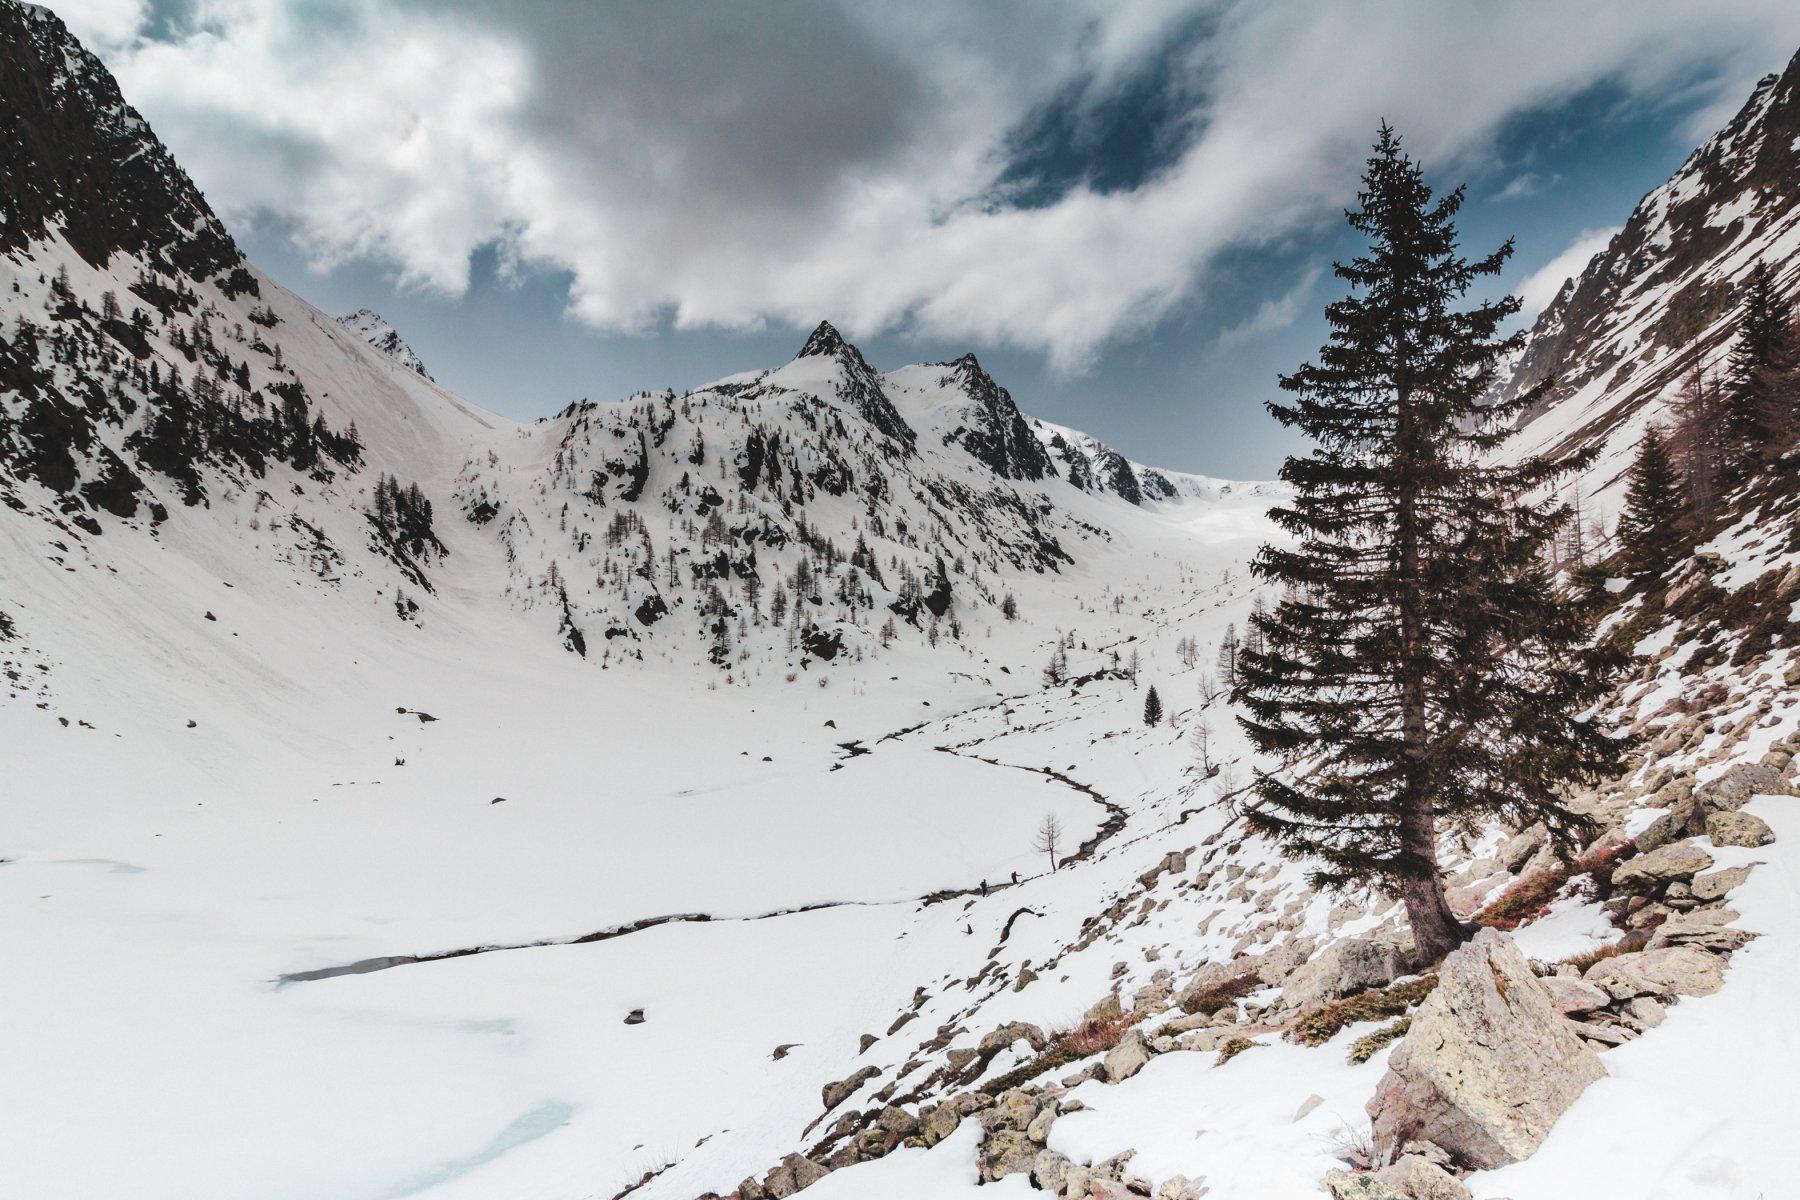 San Bernolfo (Lago di) da Strepeis 2019-04-22